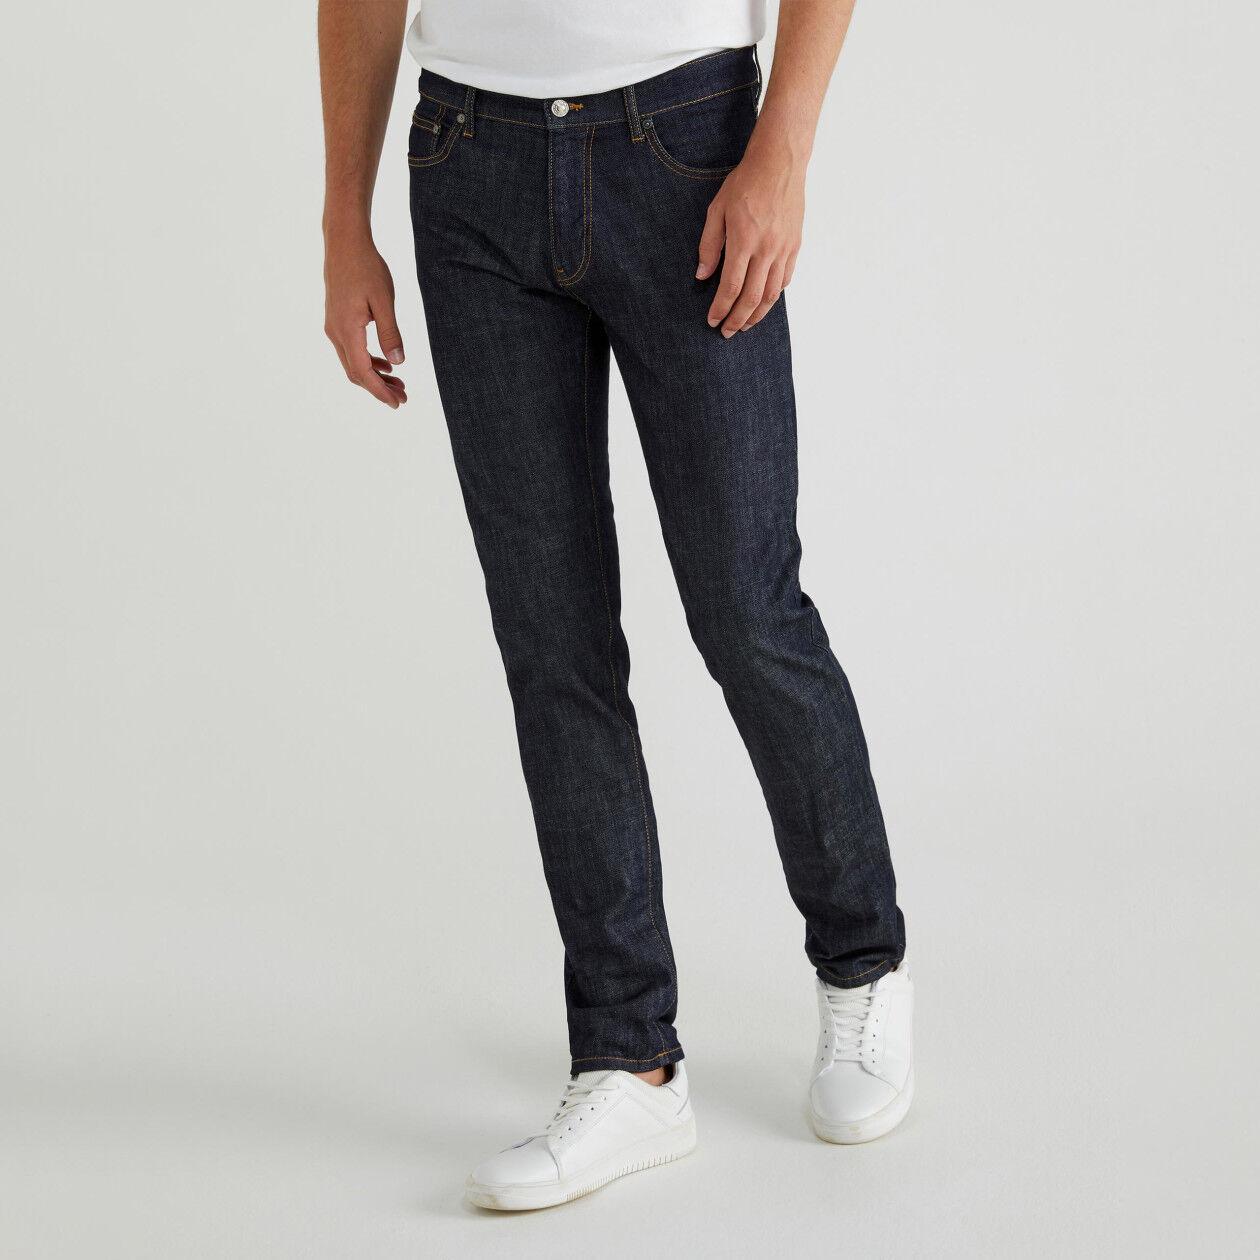 Jeans cinq poches